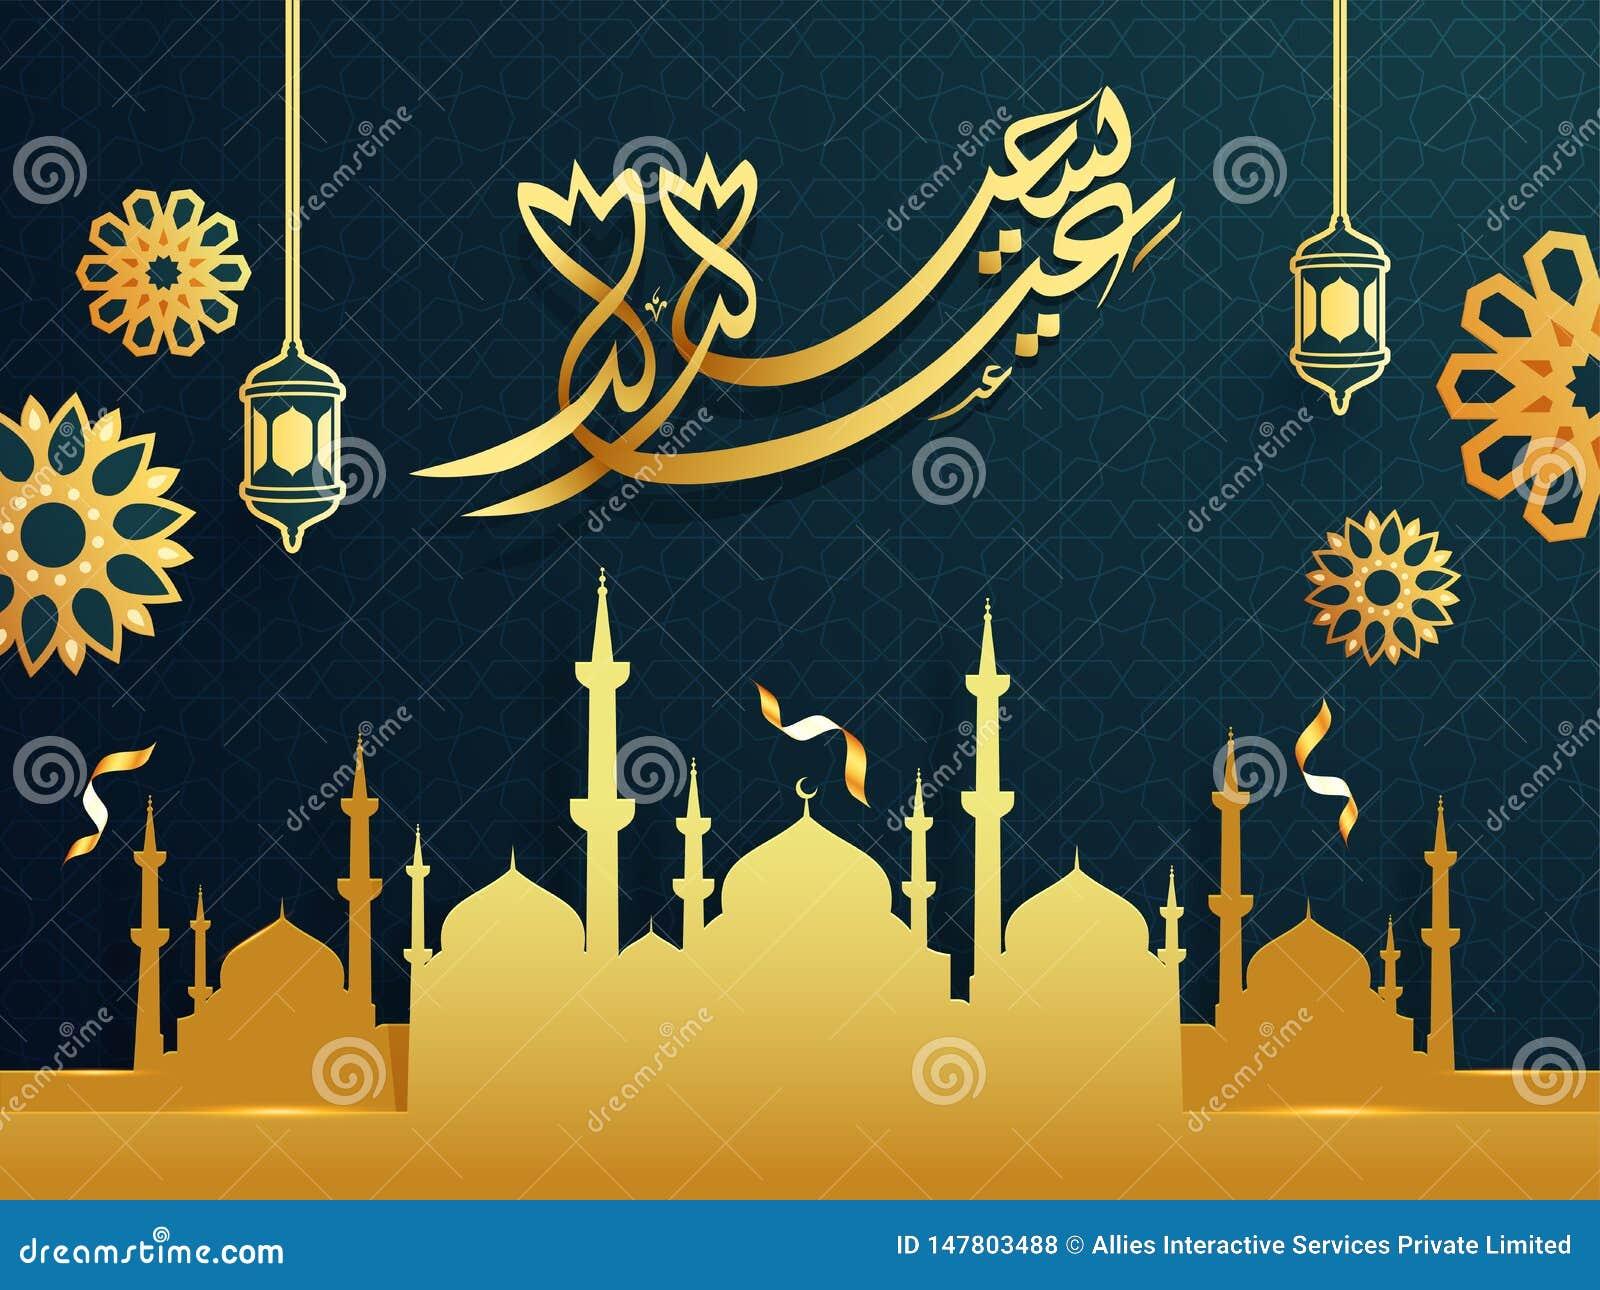 Creative Eid Mubarak Poster Or Banner Design Stock Illustration Illustration Of Green Muslim 147803488